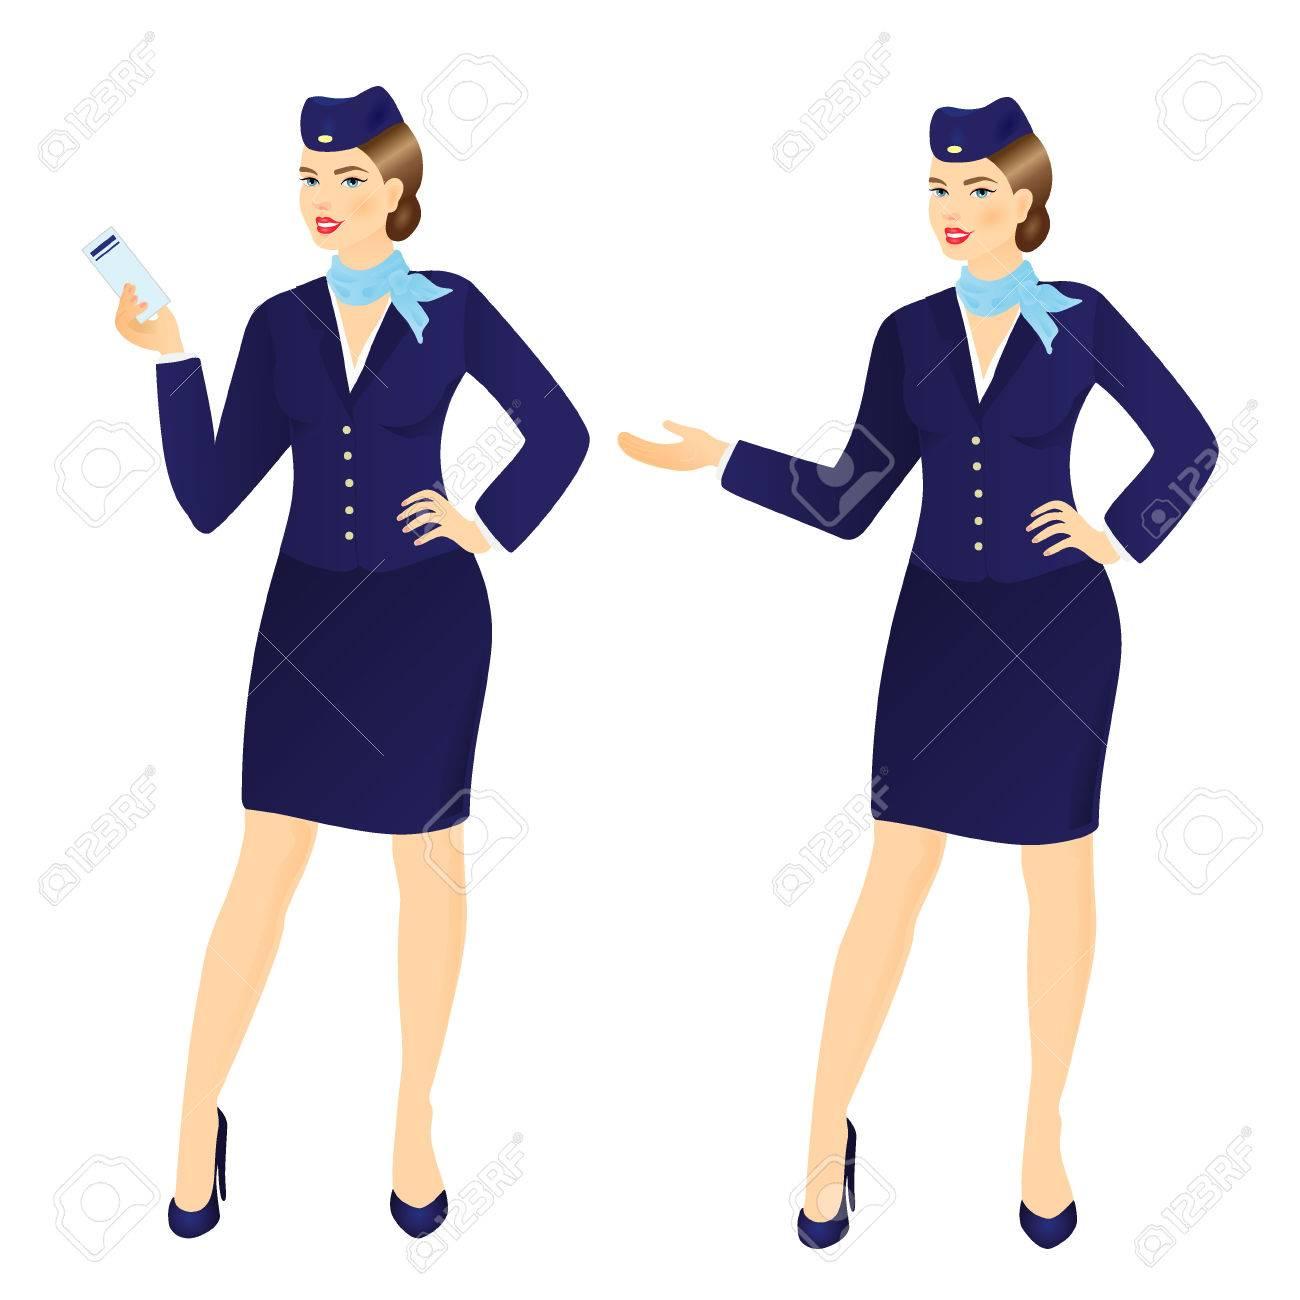 Vector Illustration De La Jeune Hotesse De L Air Attrayant Dans